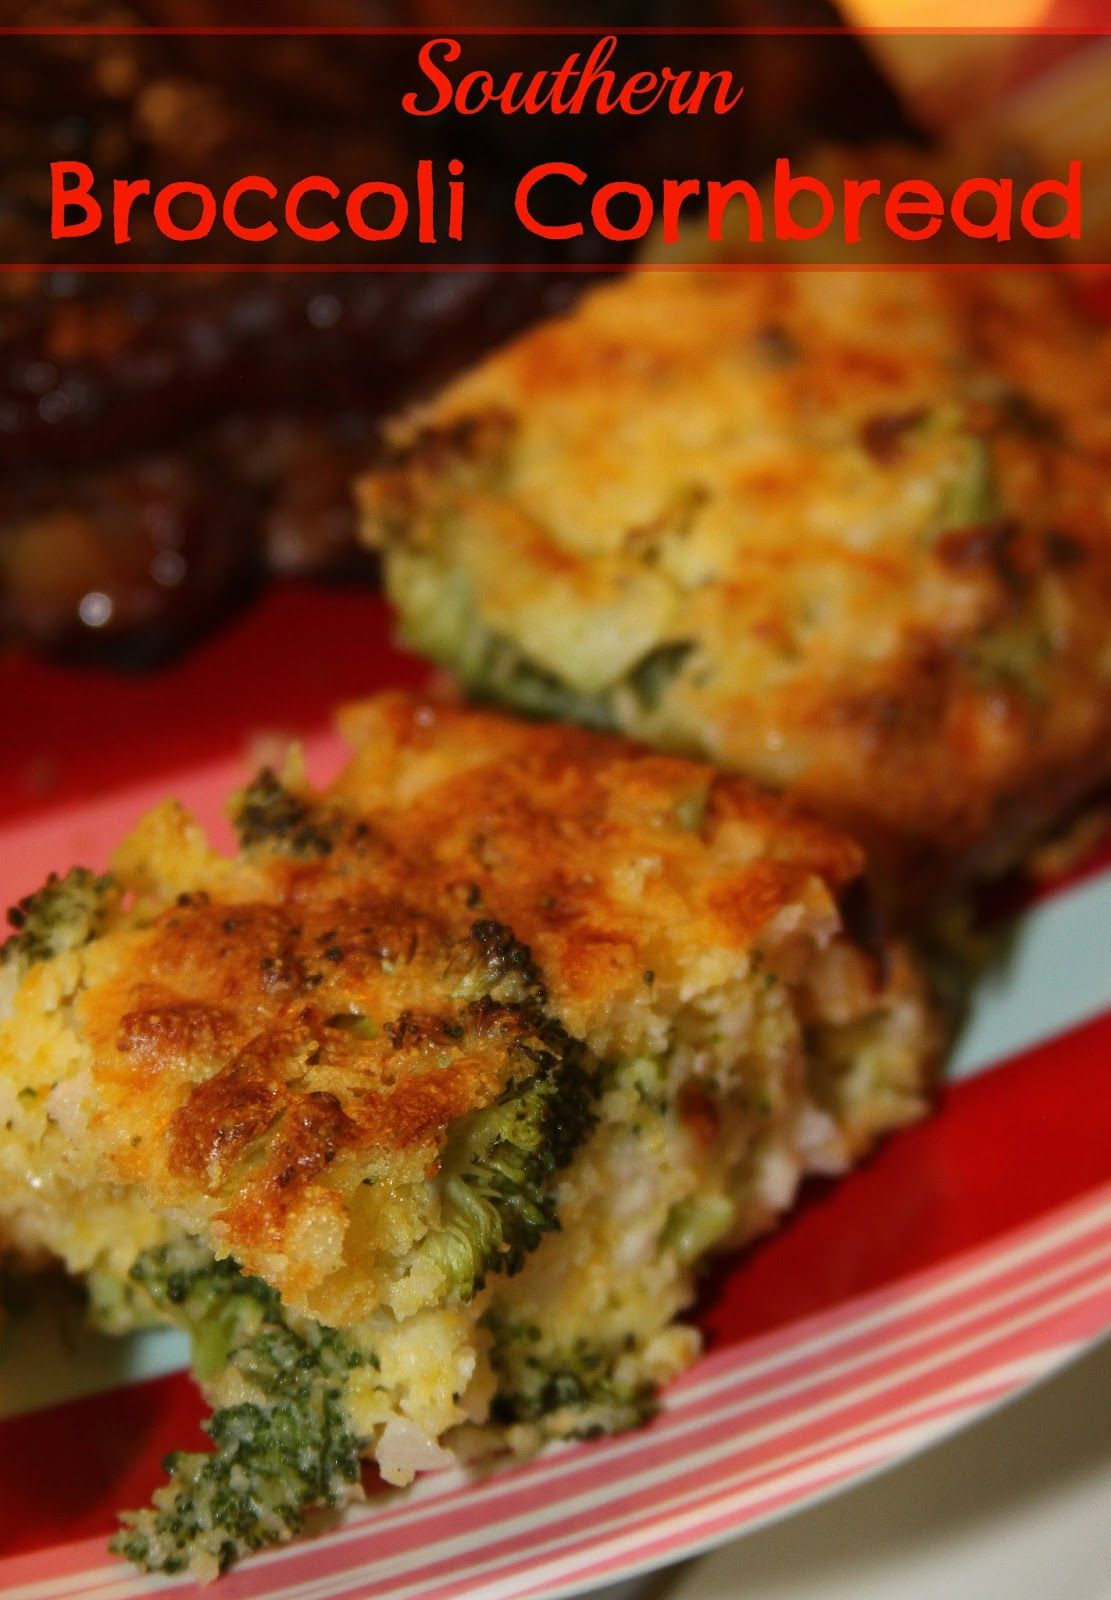 broccoli cornbread nicki p wood southern cookbook giveaway for rh pinterest com